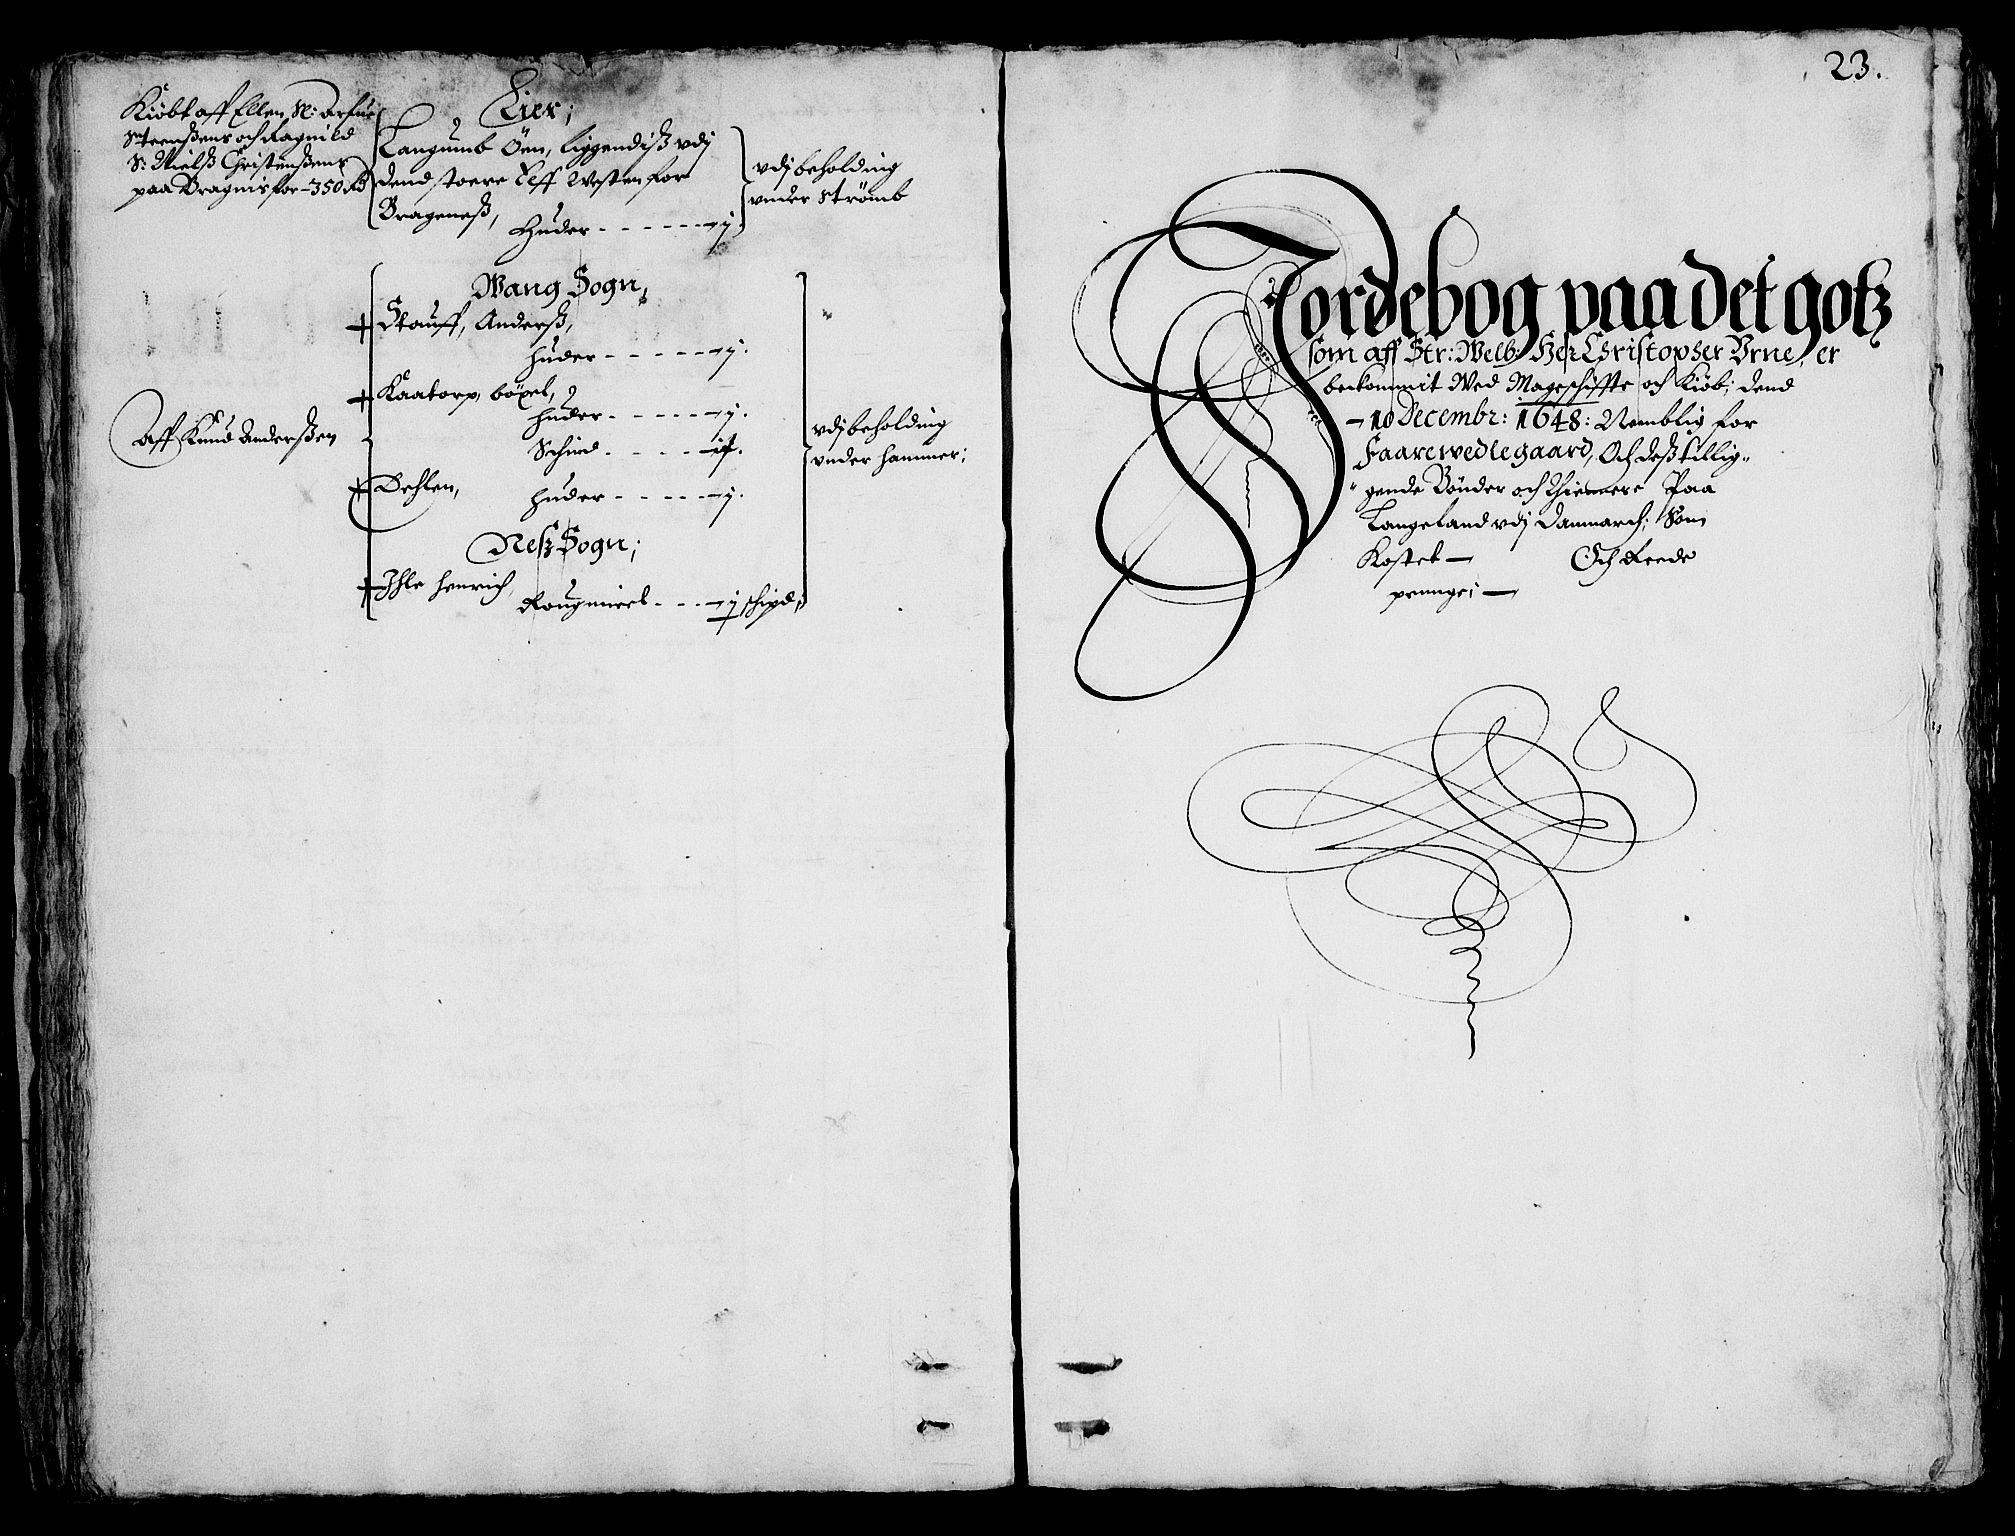 RA, Rentekammeret inntil 1814, Realistisk ordnet avdeling, On/L0001: Statens gods, 1651, s. 22b-23a